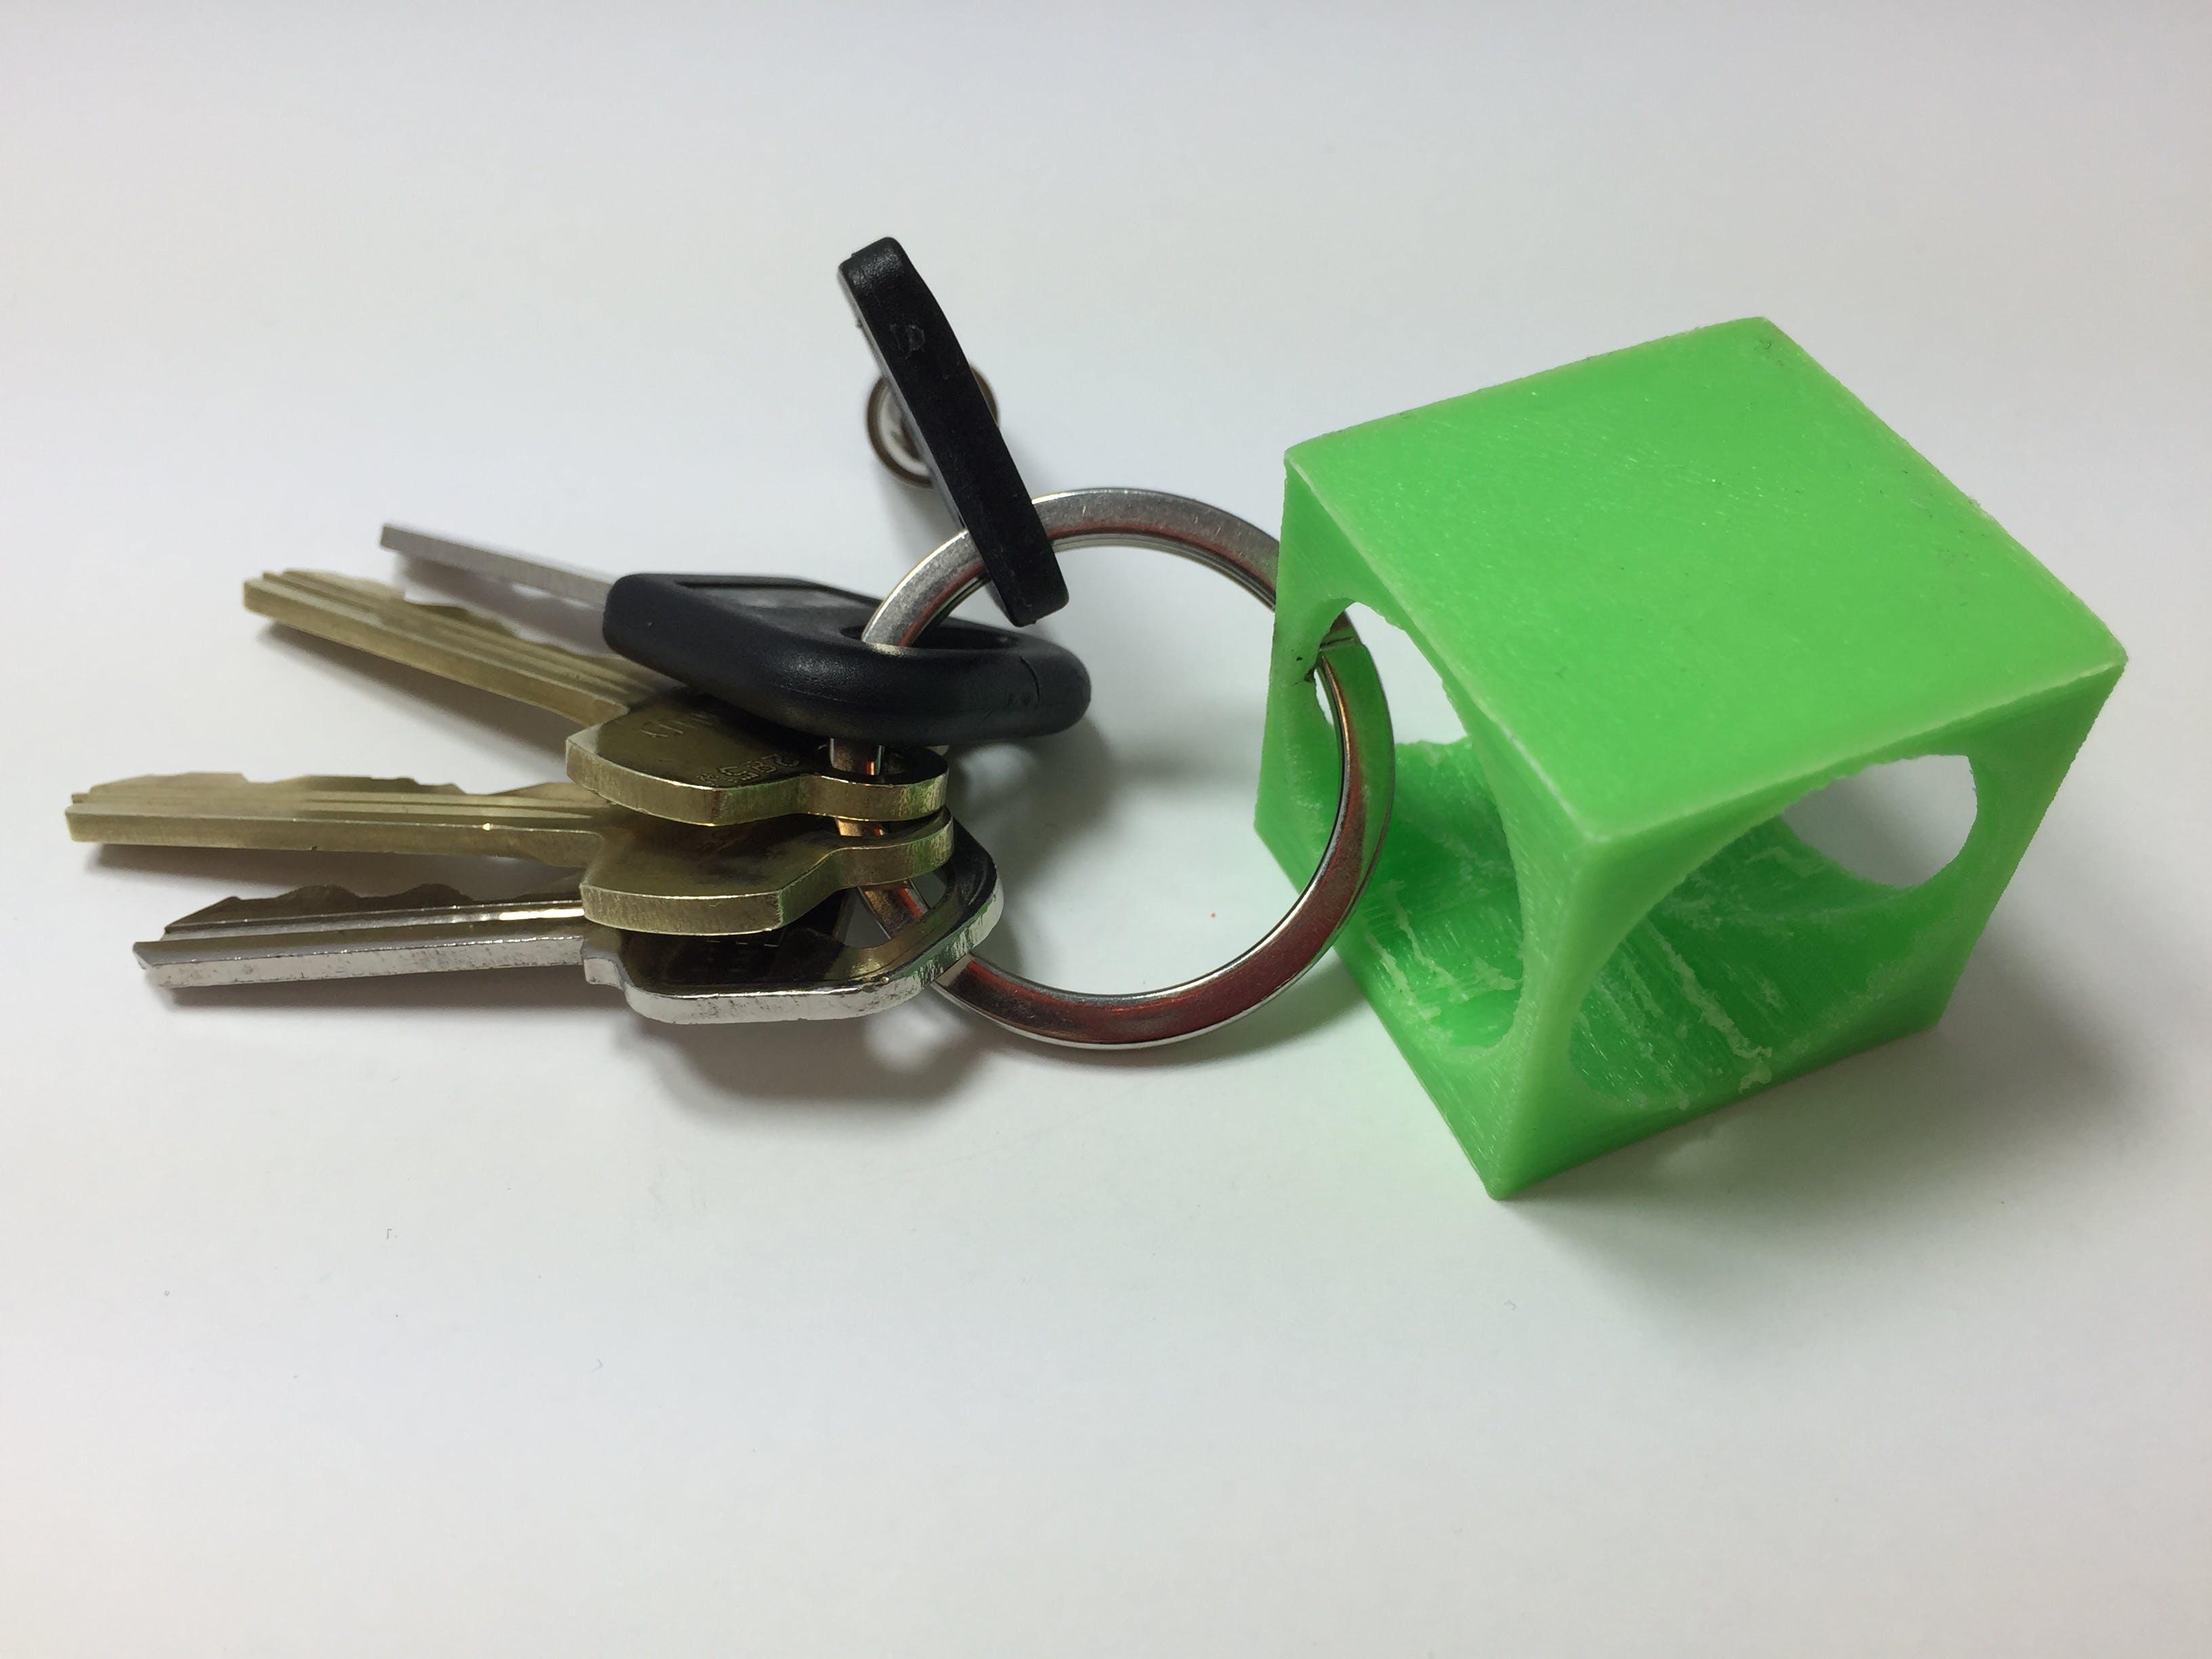 Easy key